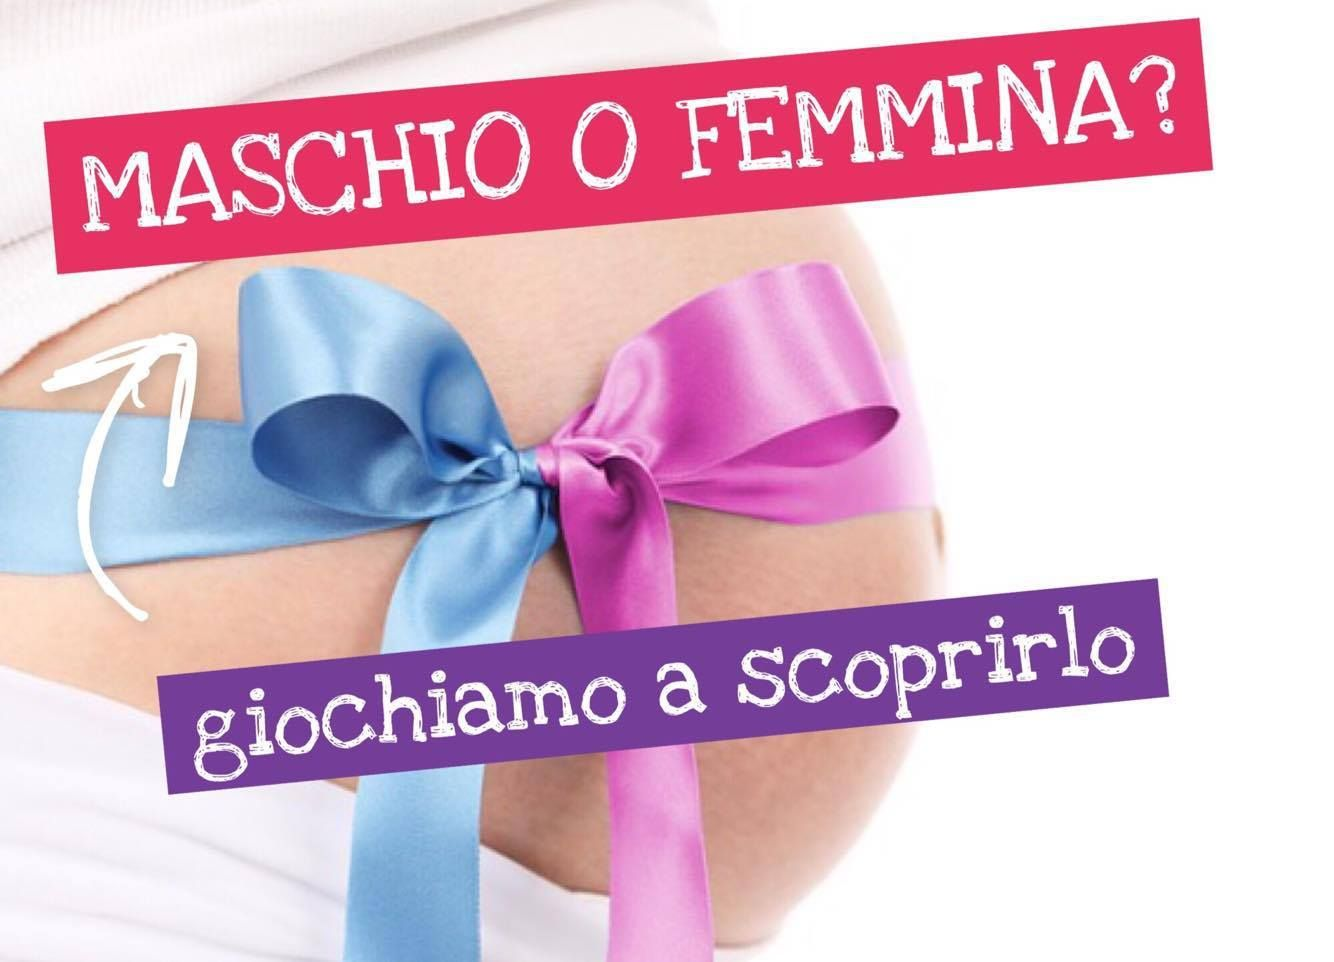 46+ Maschio o femmina gravidanza trends